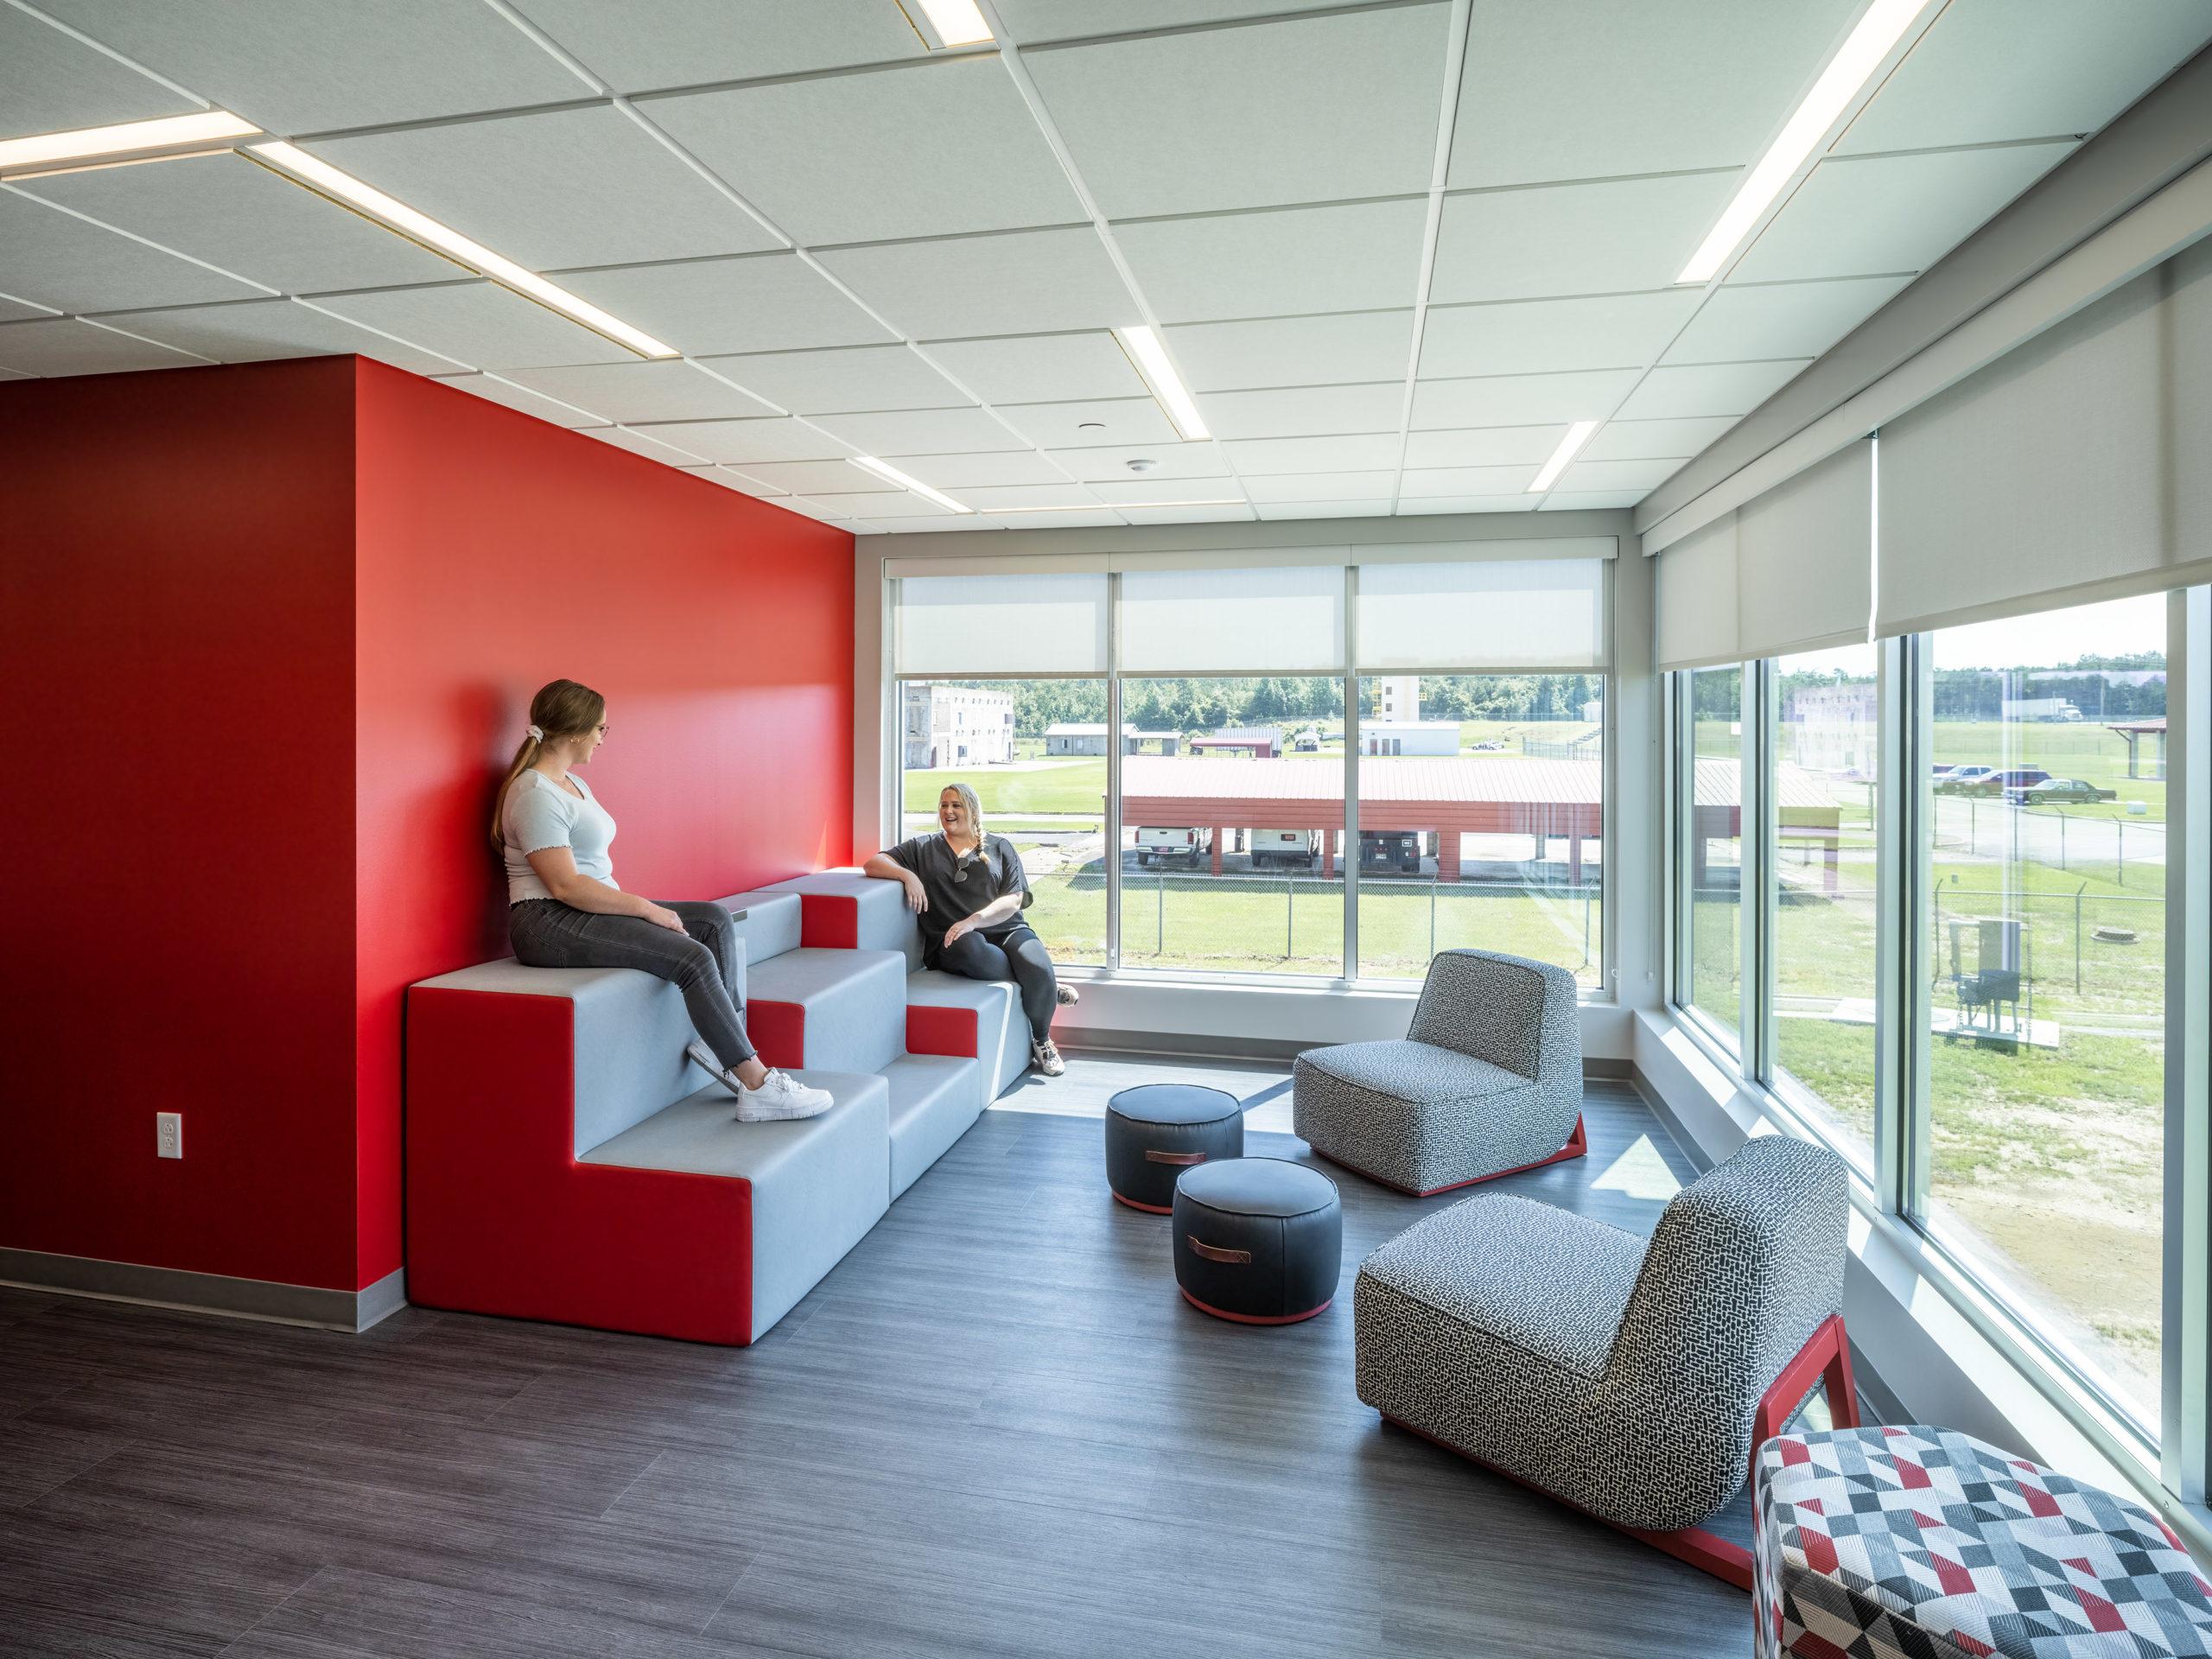 Image of ASUN Student Center Renovation interior